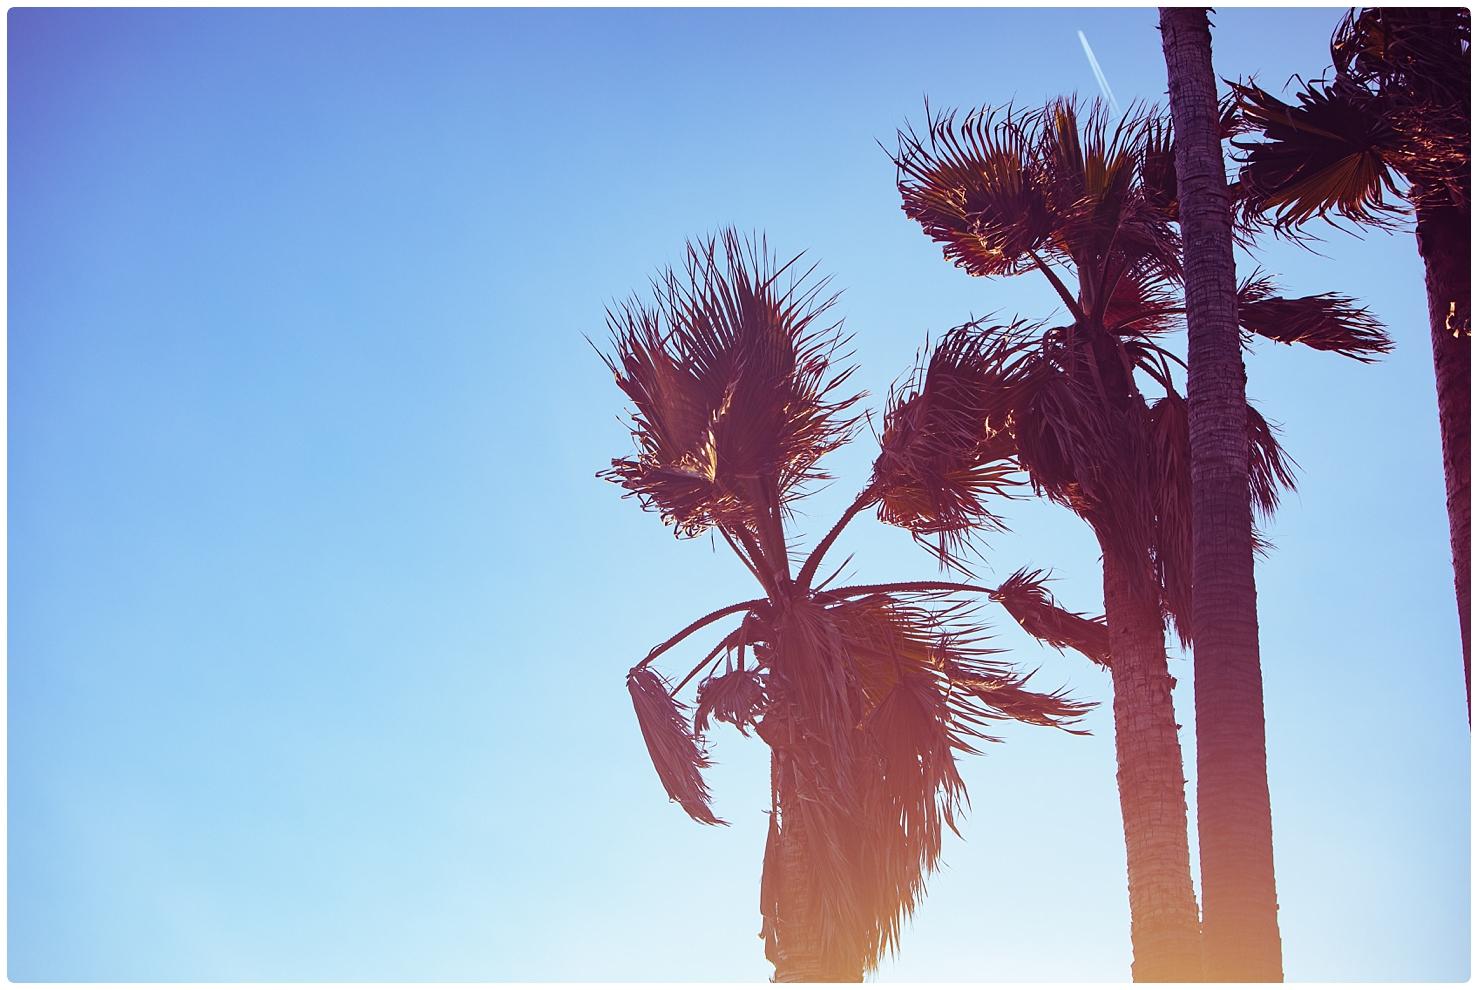 Beach,California,Venice,Venice Beach,haylo photo,haylo photography,northern virginia photographer,